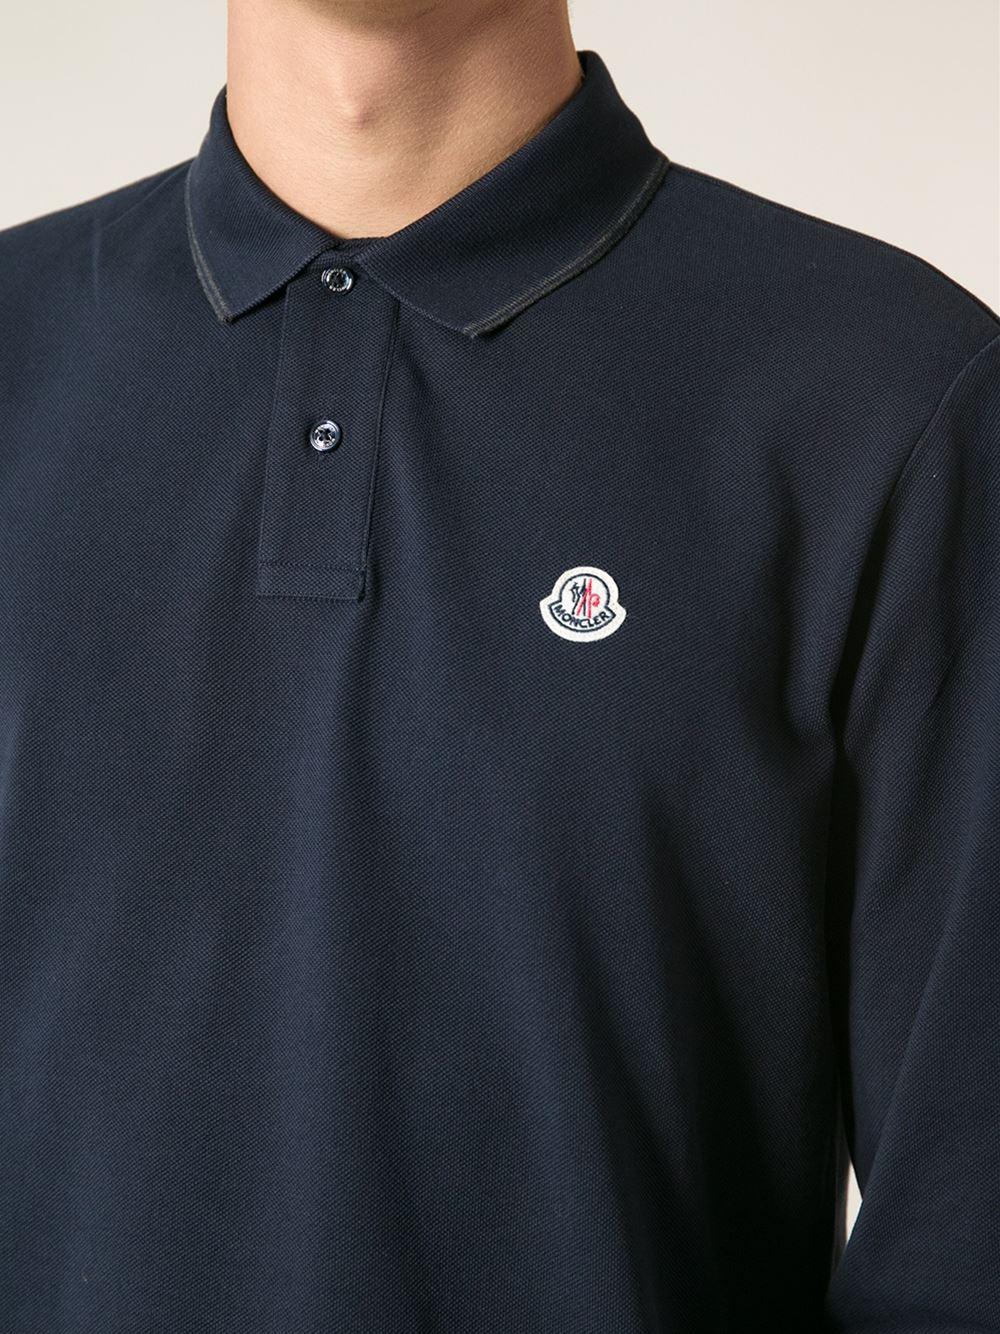 e56a5c584b65 Moncler Long Sleeved Polo Shirt in Blue for Men - Lyst